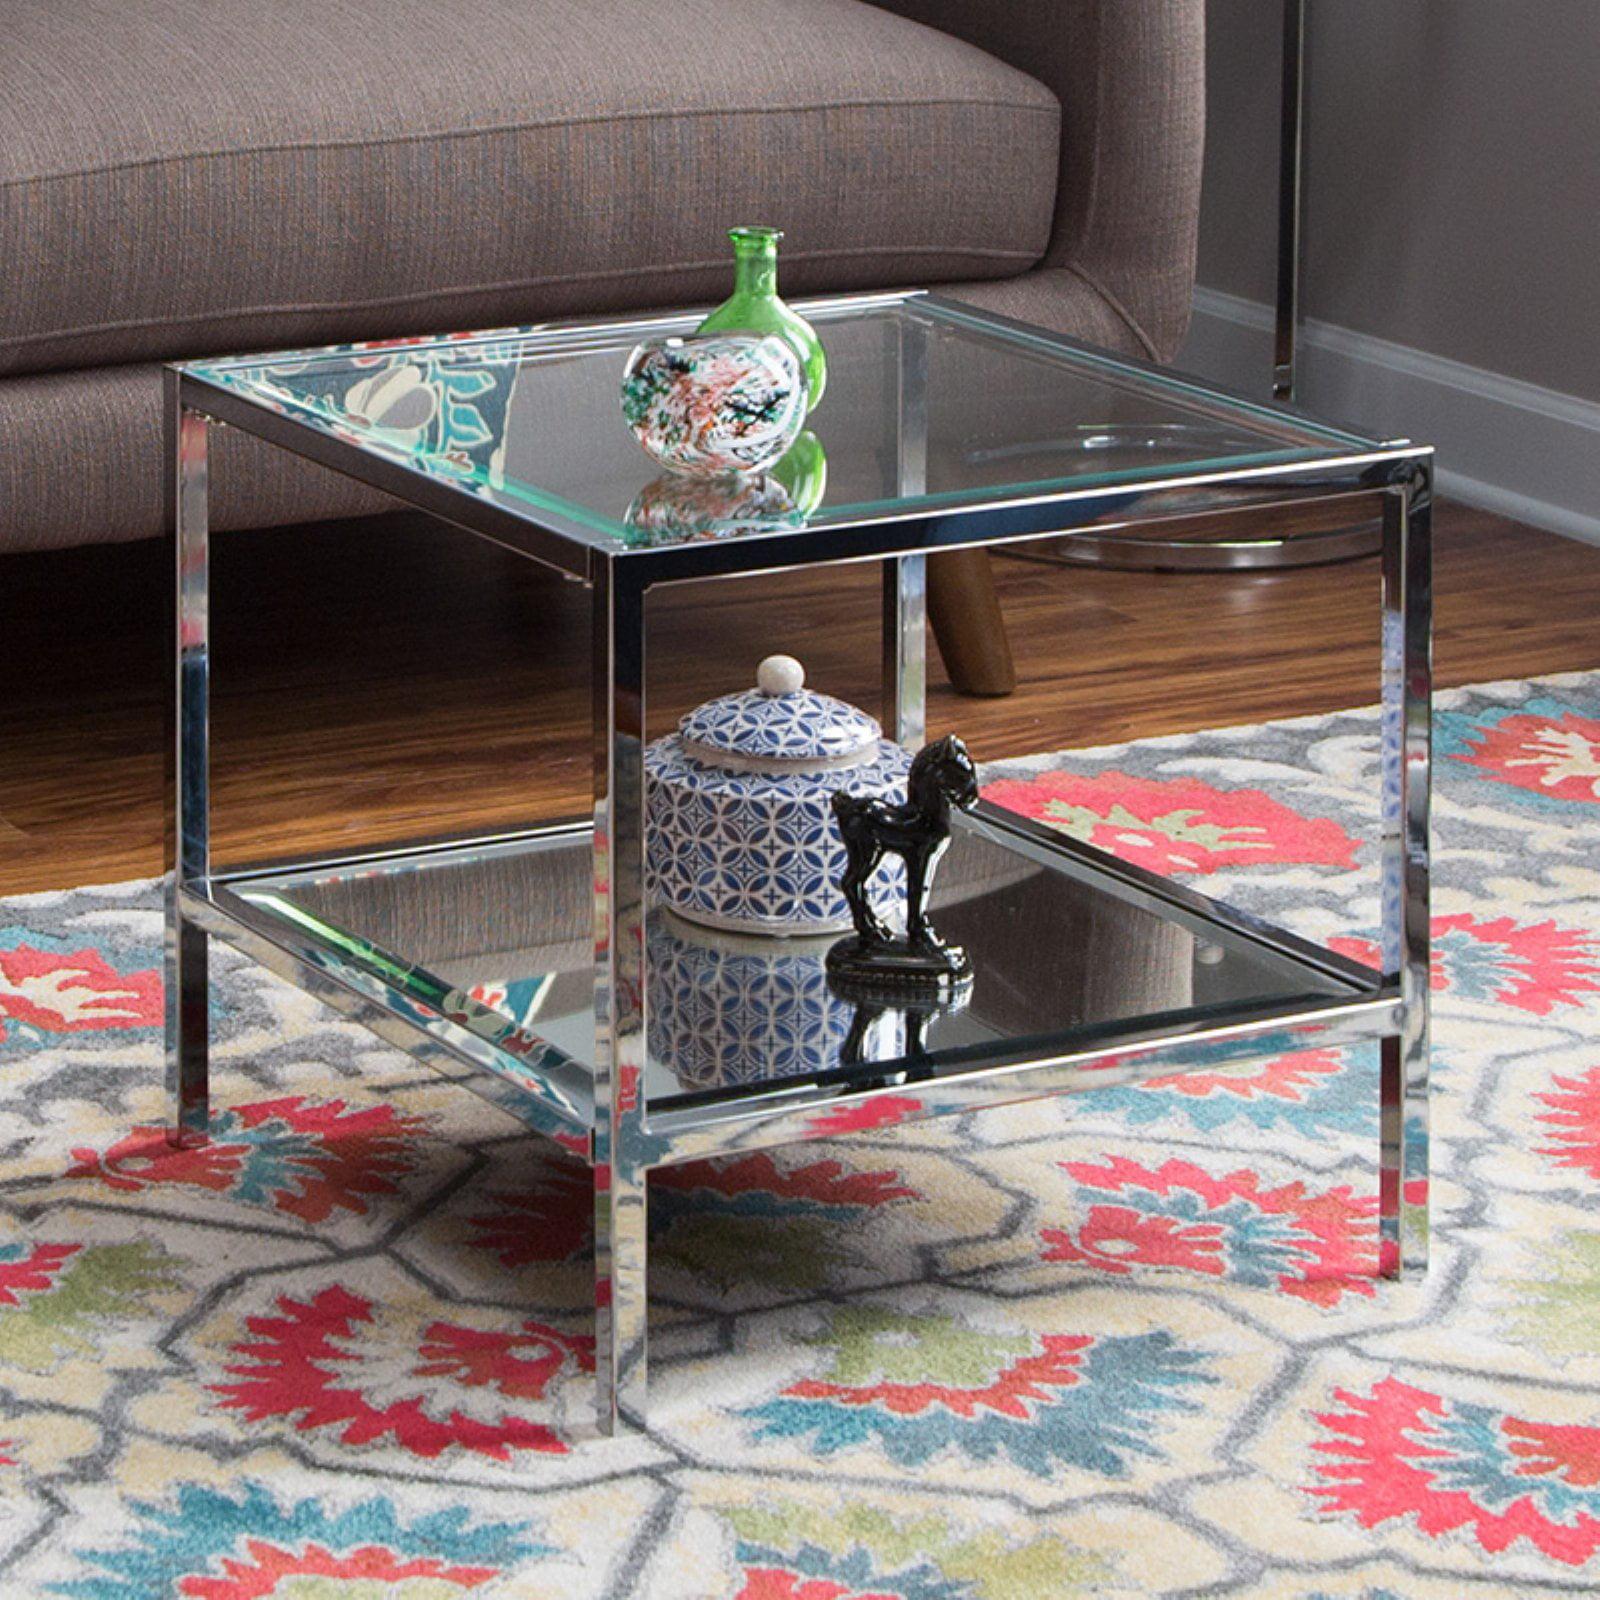 Belham Living Lamont Bunching Coffee Table - Chrome